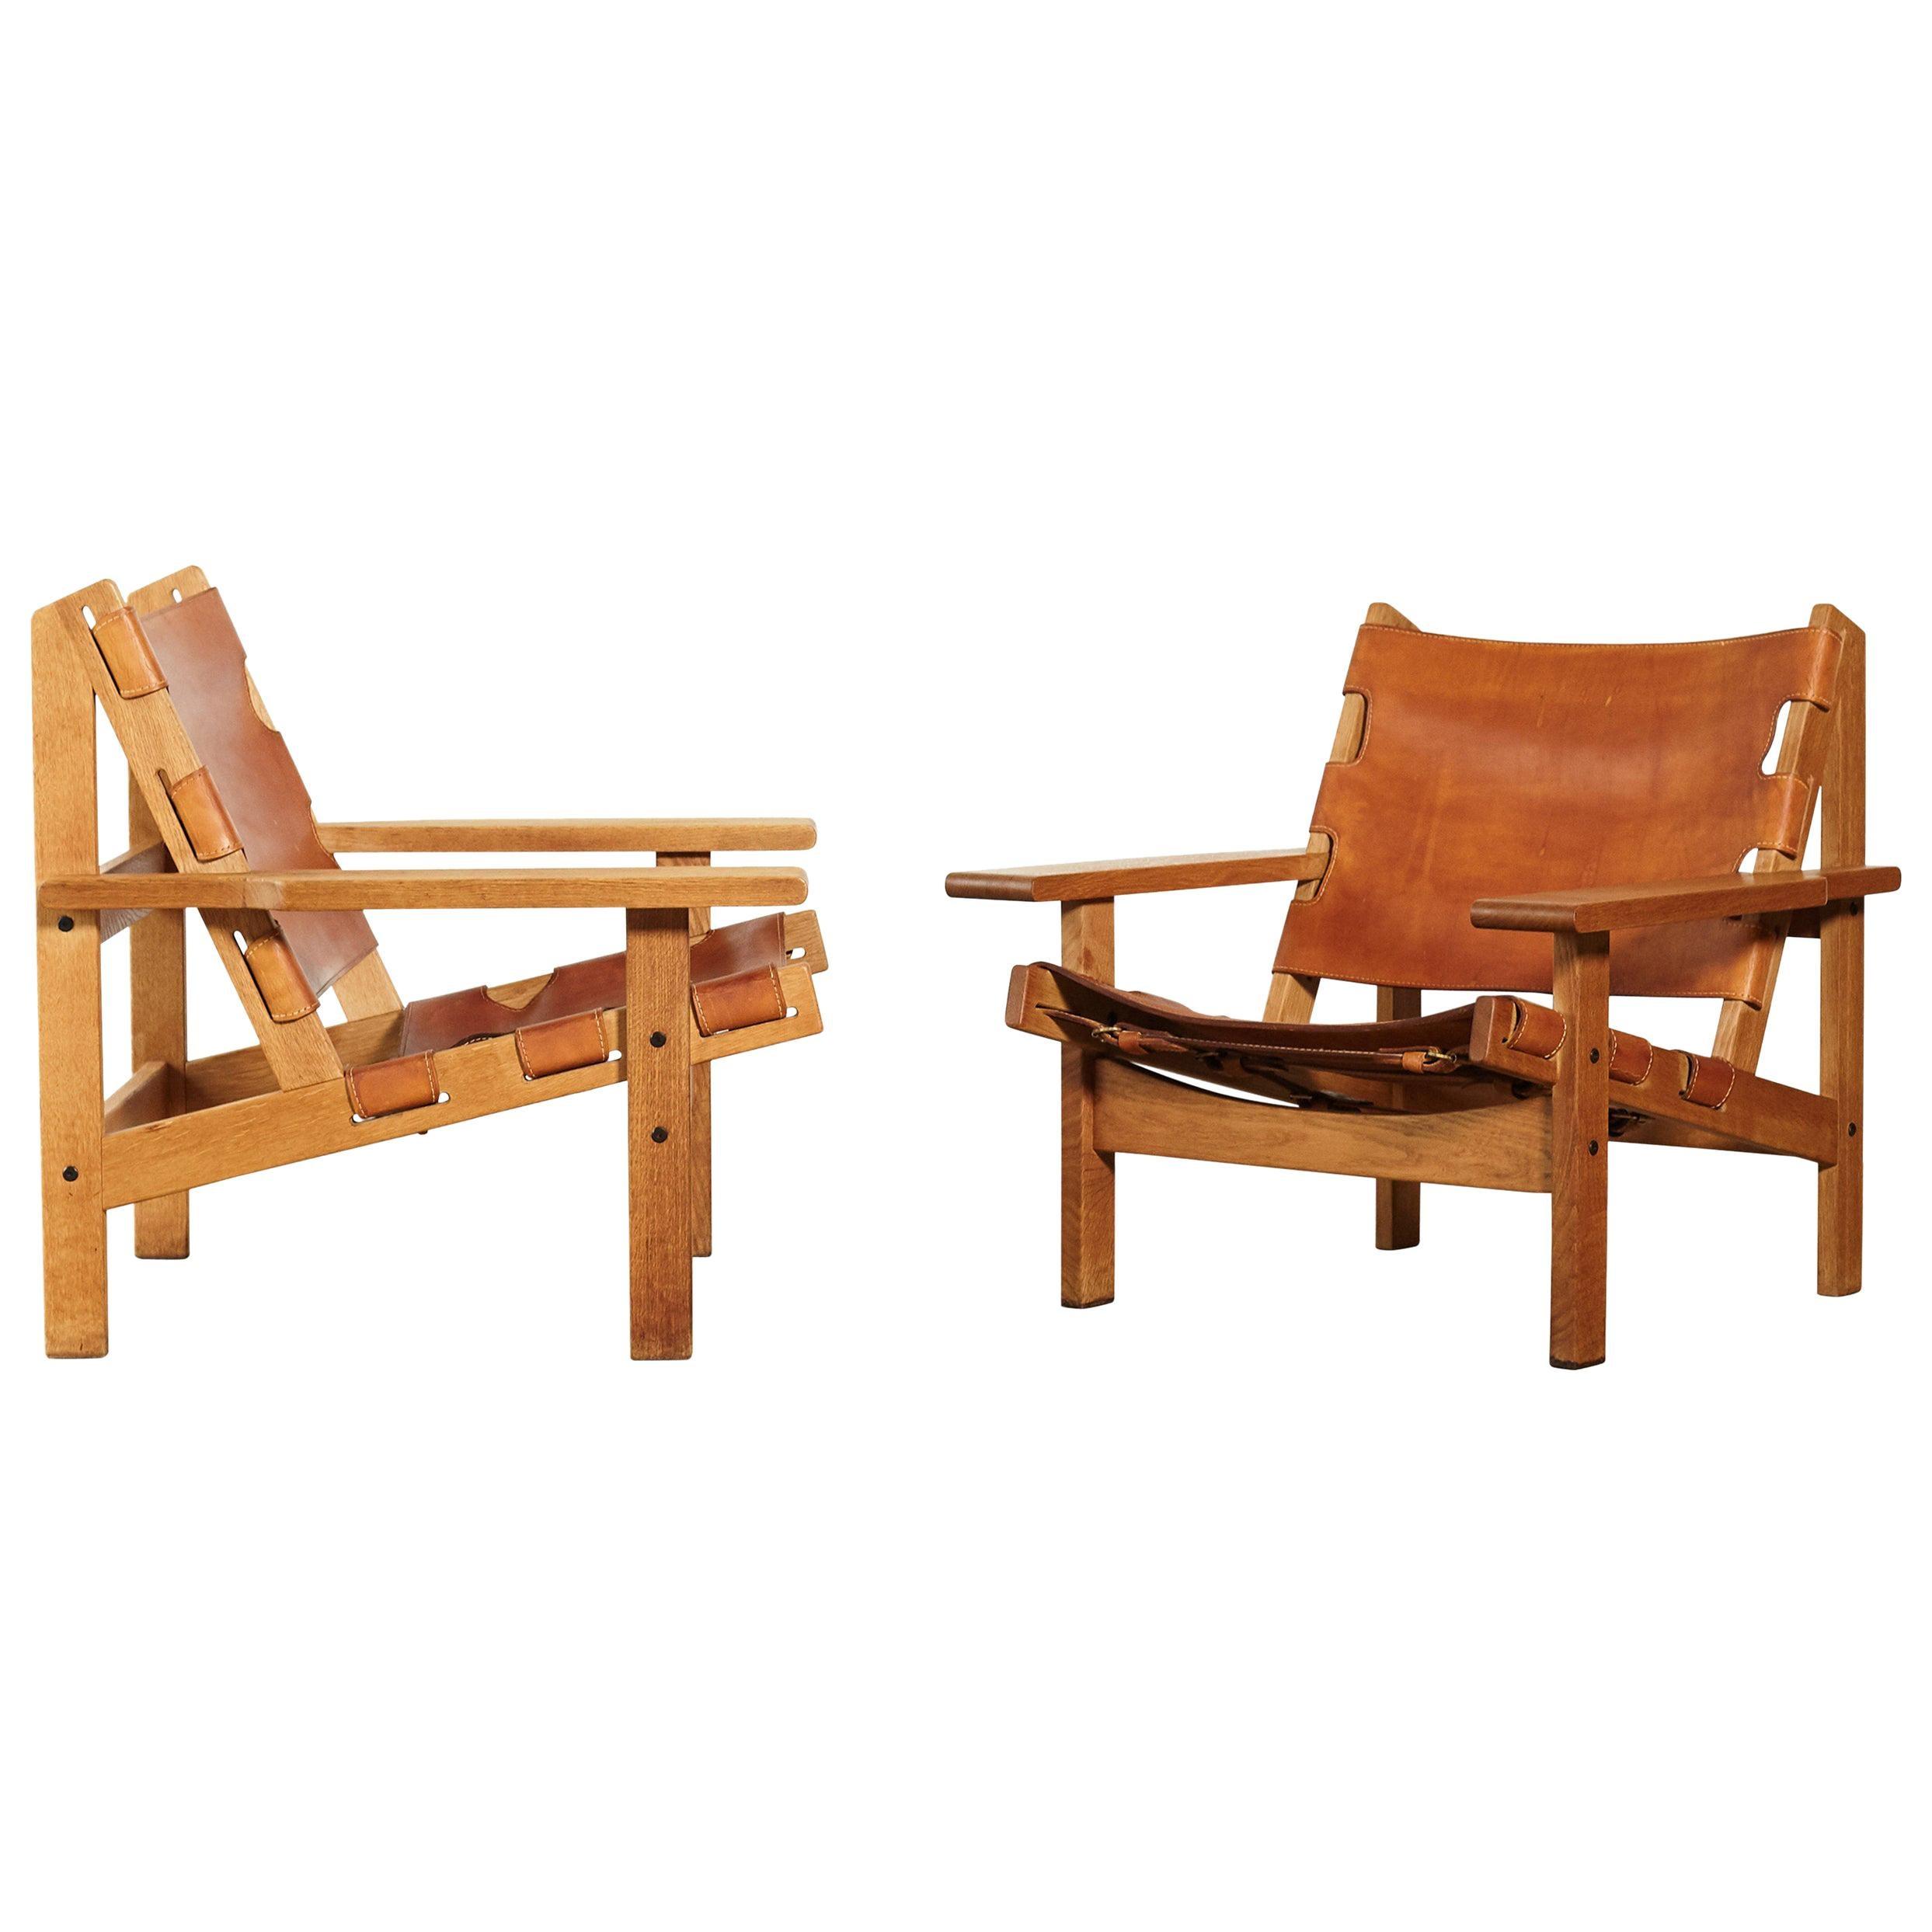 Pair of Kurt Ostervig / Erling Jessen Hunting Chairs, Denmark, 1960s